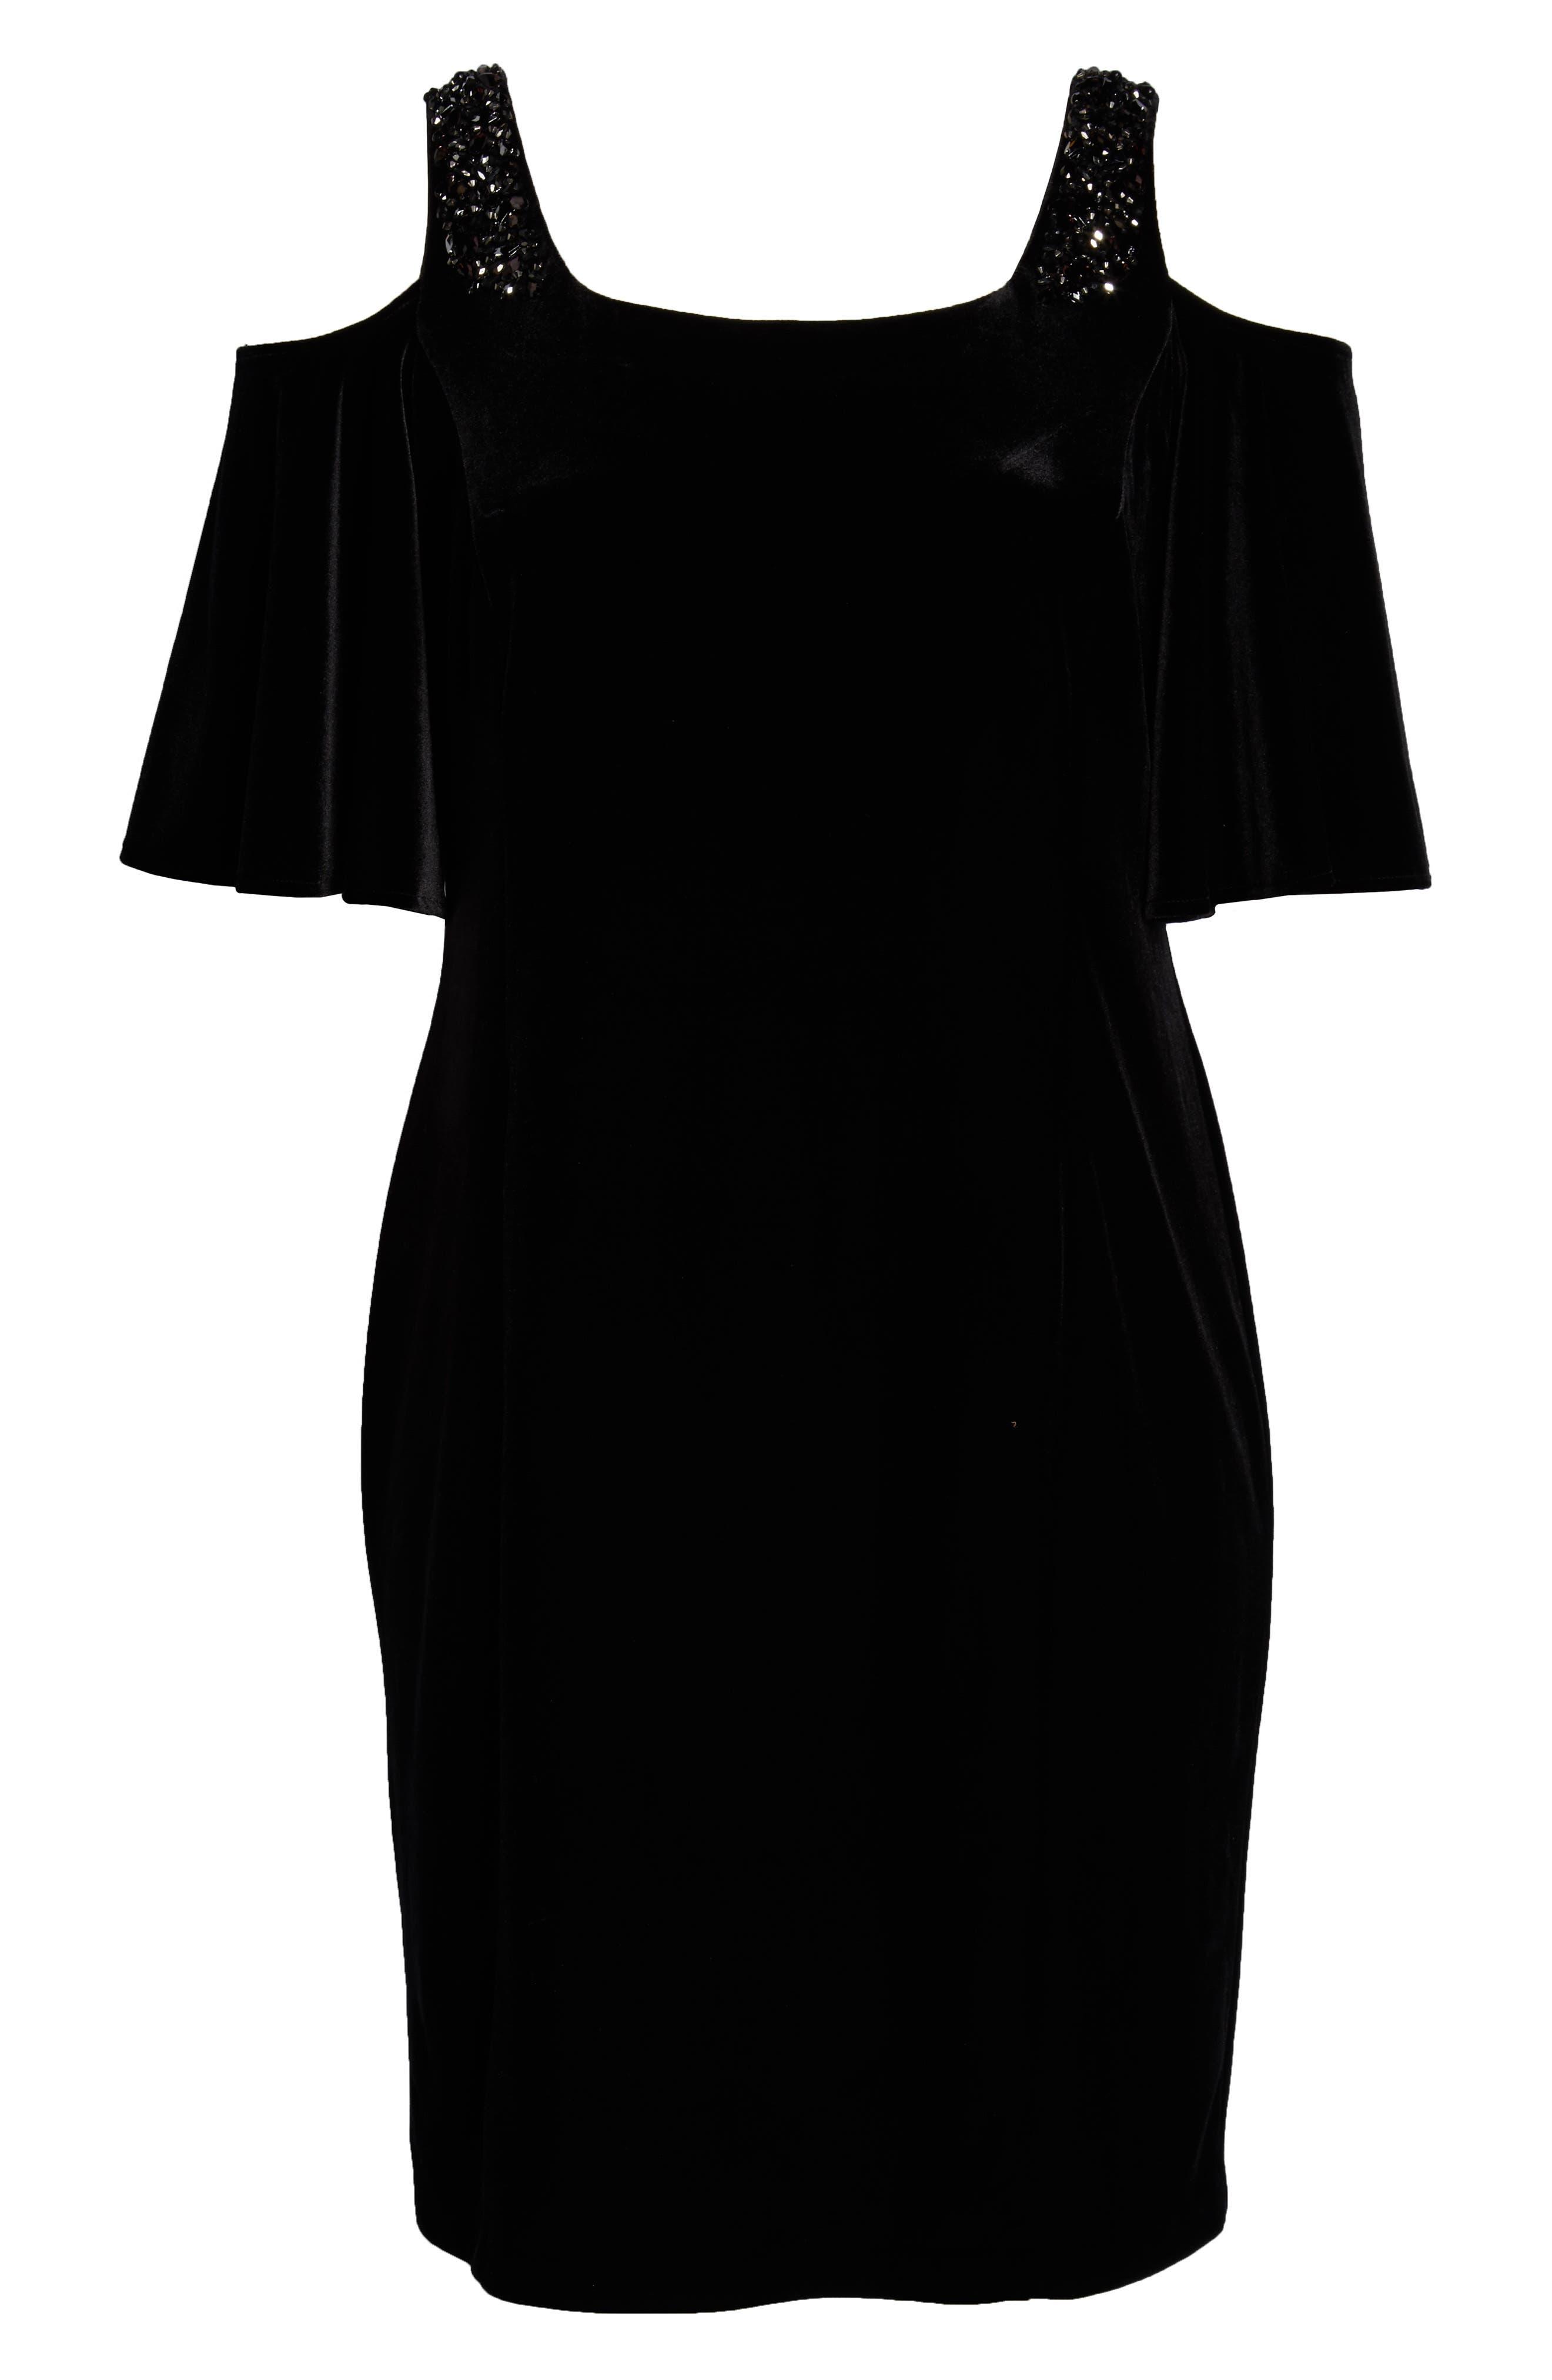 ALEX EVENINGS,                             Velvet Cold Shoulder Sheath Dress,                             Alternate thumbnail 7, color,                             001